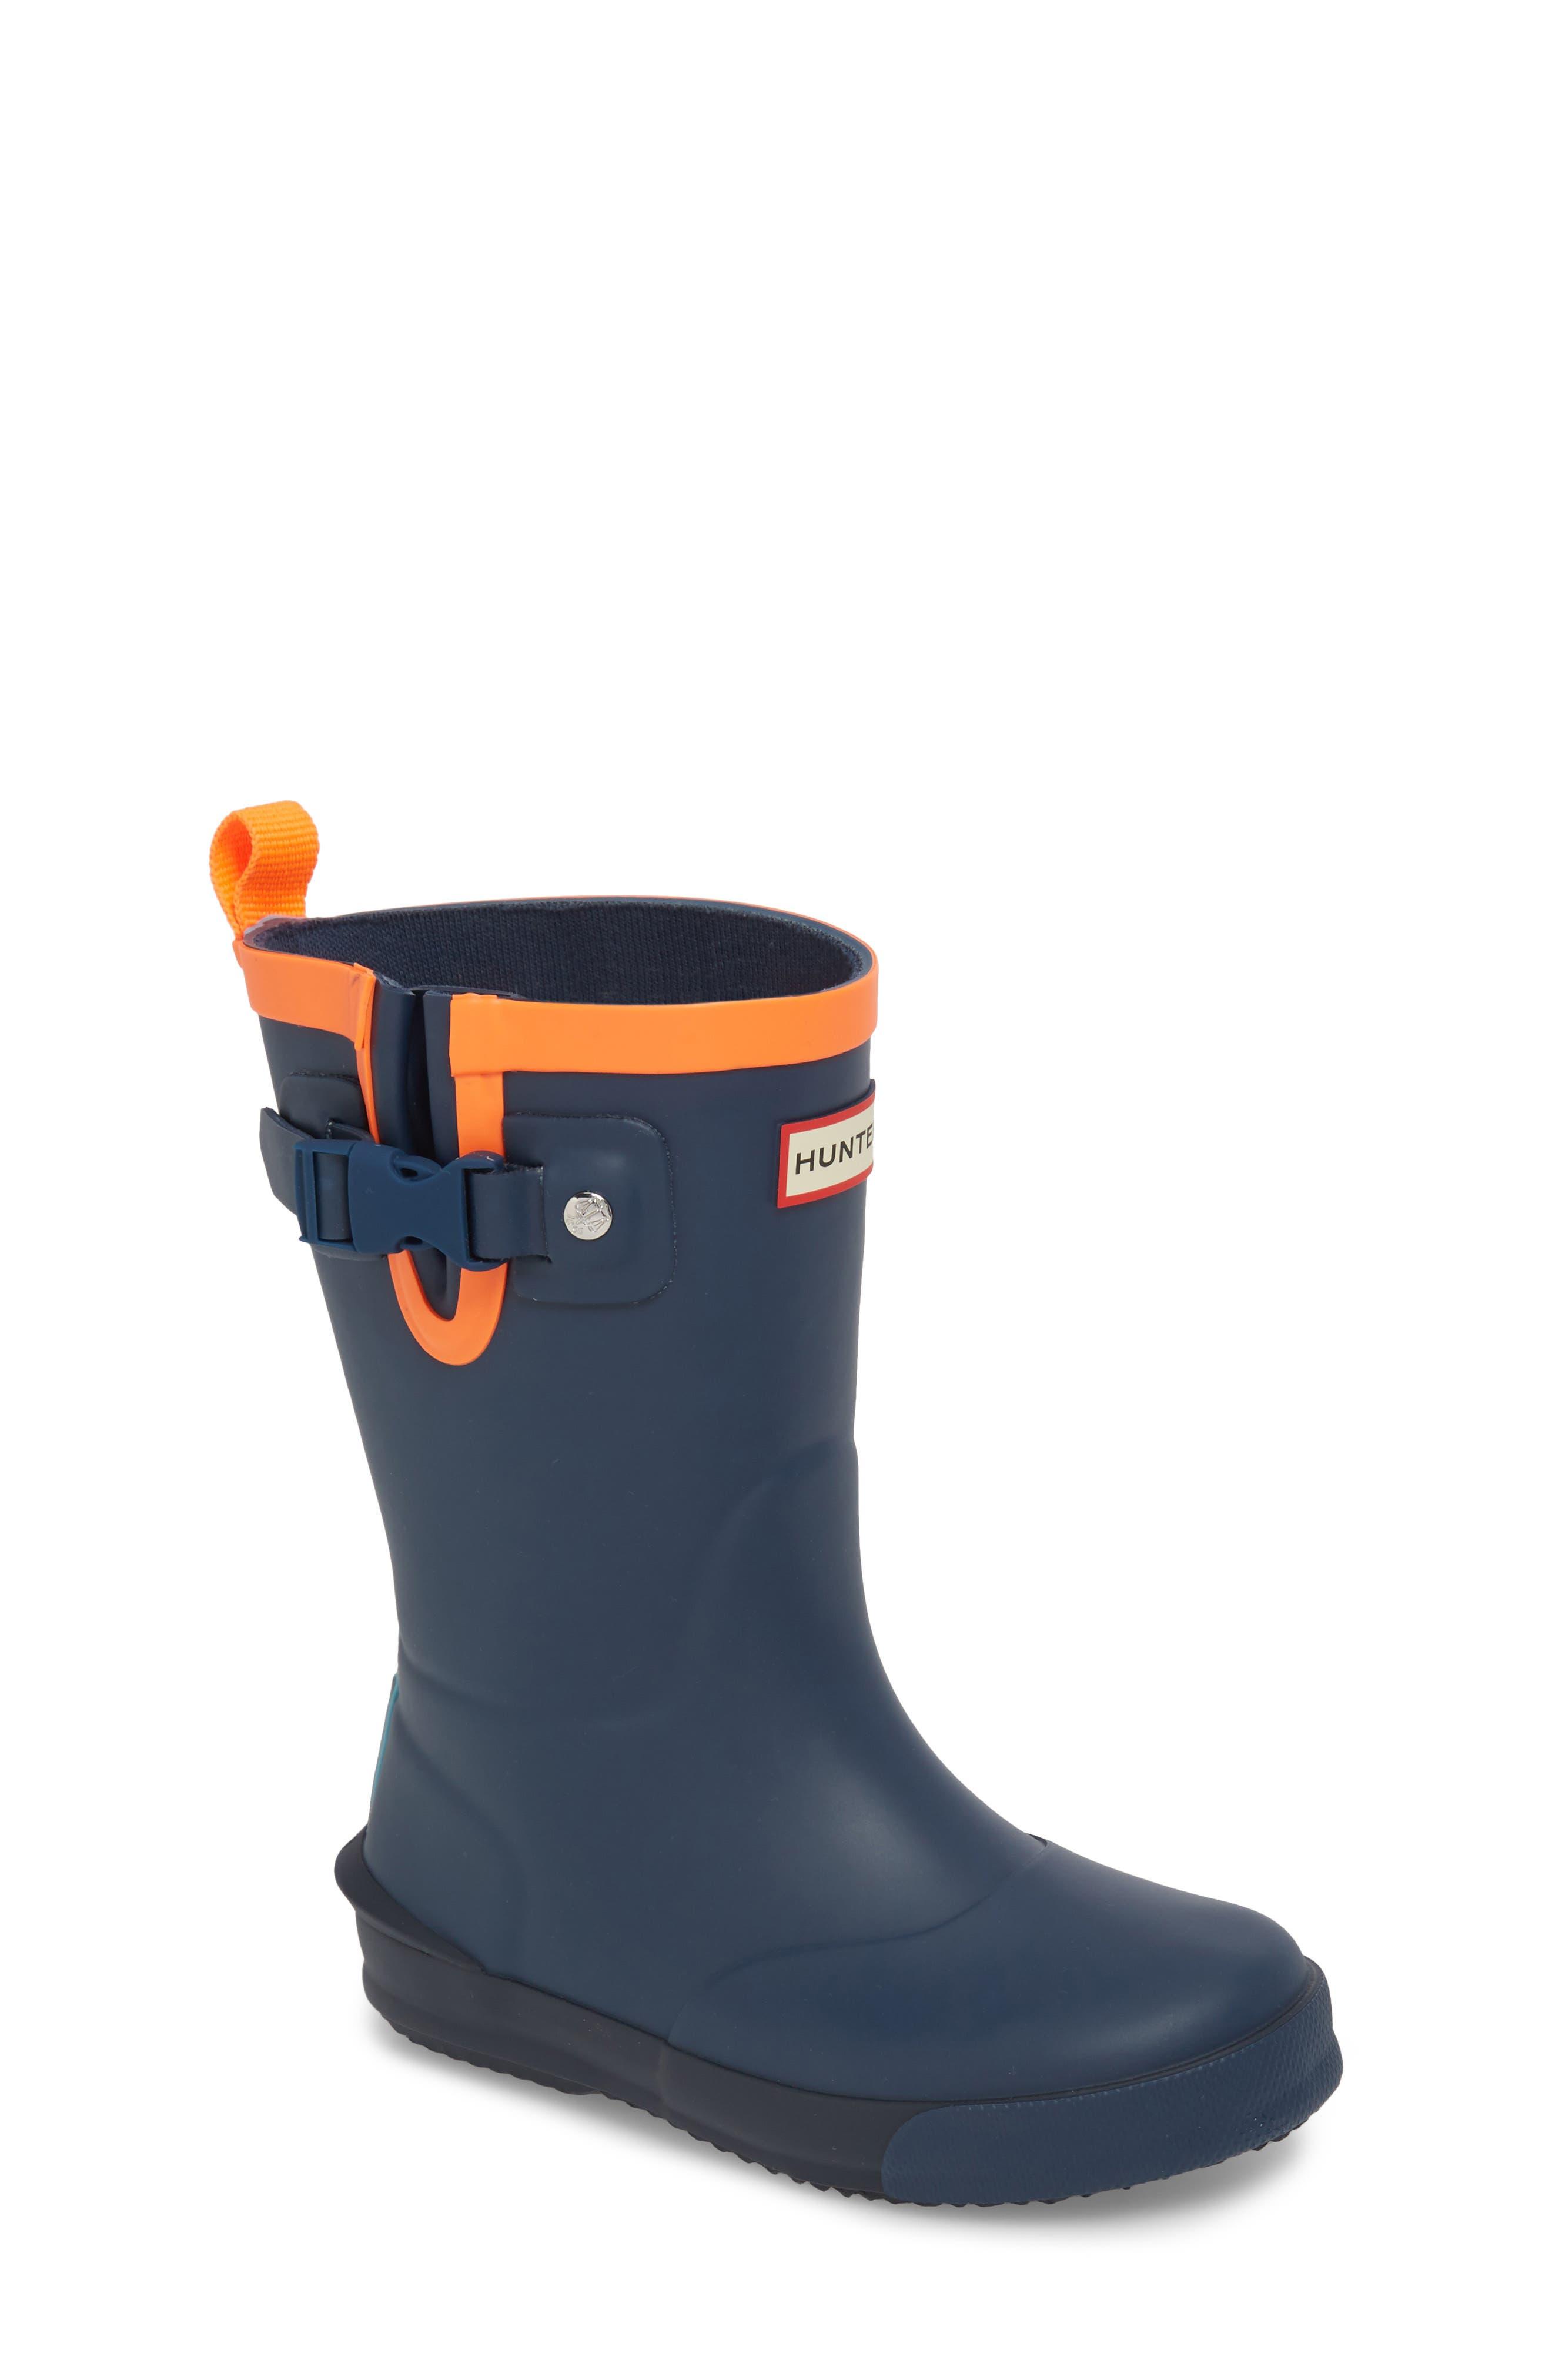 'Davison' Rain Boot,                             Main thumbnail 1, color,                             Dark Lake Blue/ Navy/ Hazard